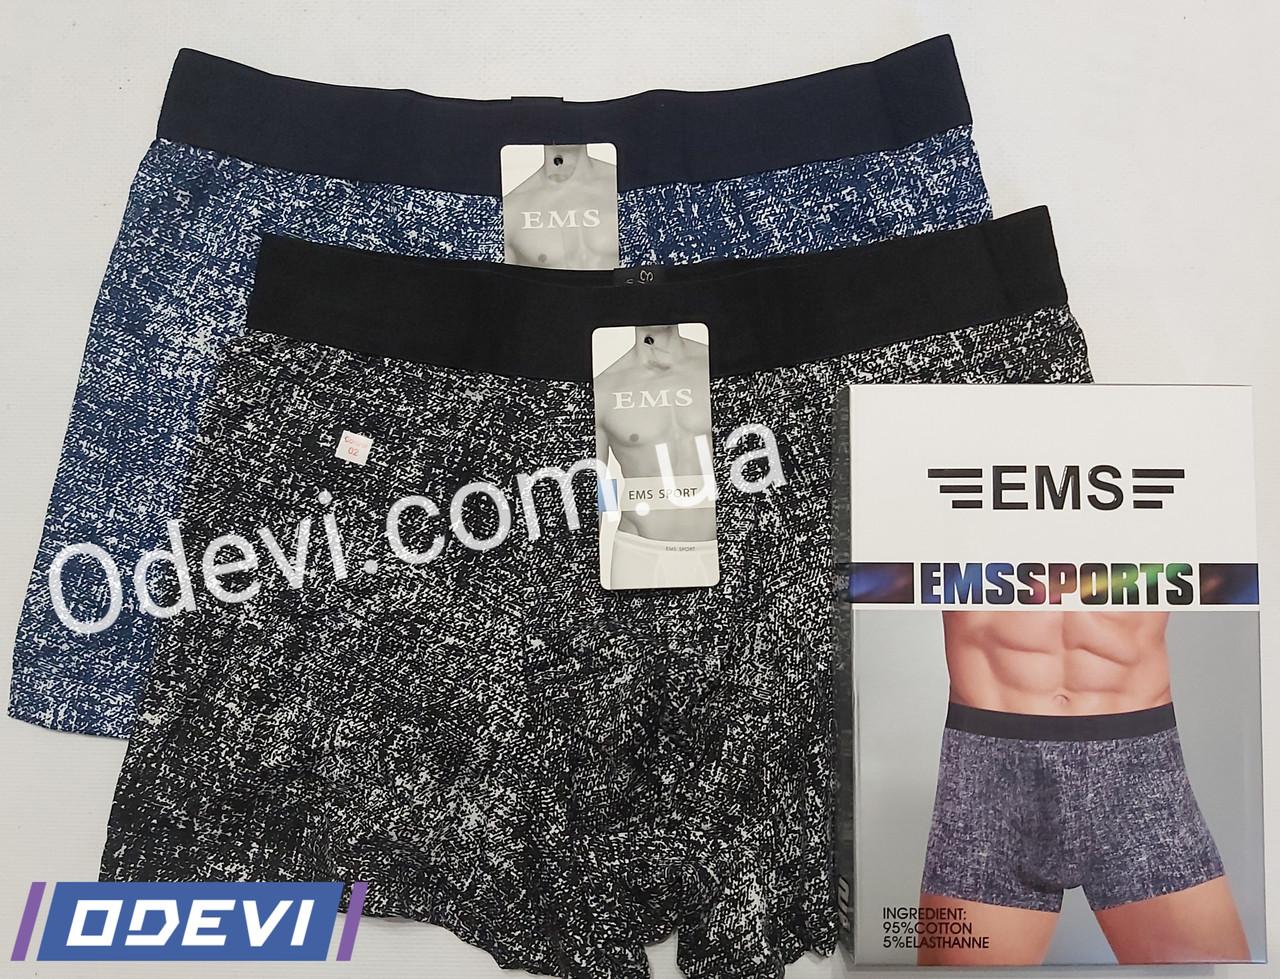 EMS боксери бавовна з бамбуком джинс меланж